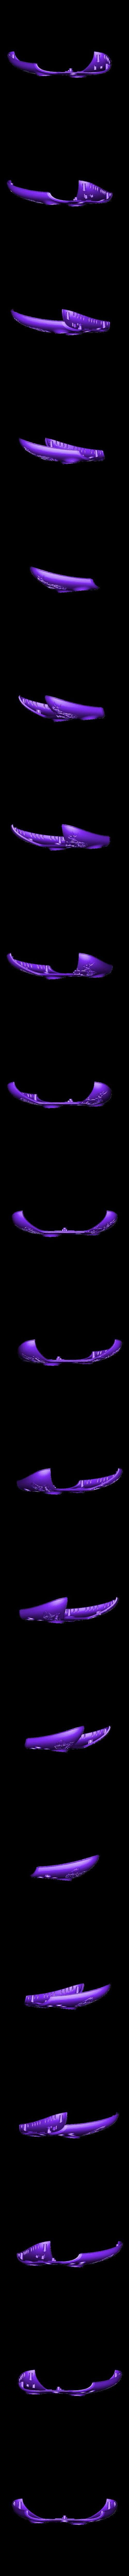 Monster_Hunter_Zinogre_Controller.stl Télécharger fichier STL gratuit Xbox One S Custom Controller Shell : Chasseur de monstres édition Zinogre • Plan imprimable en 3D, mmjames